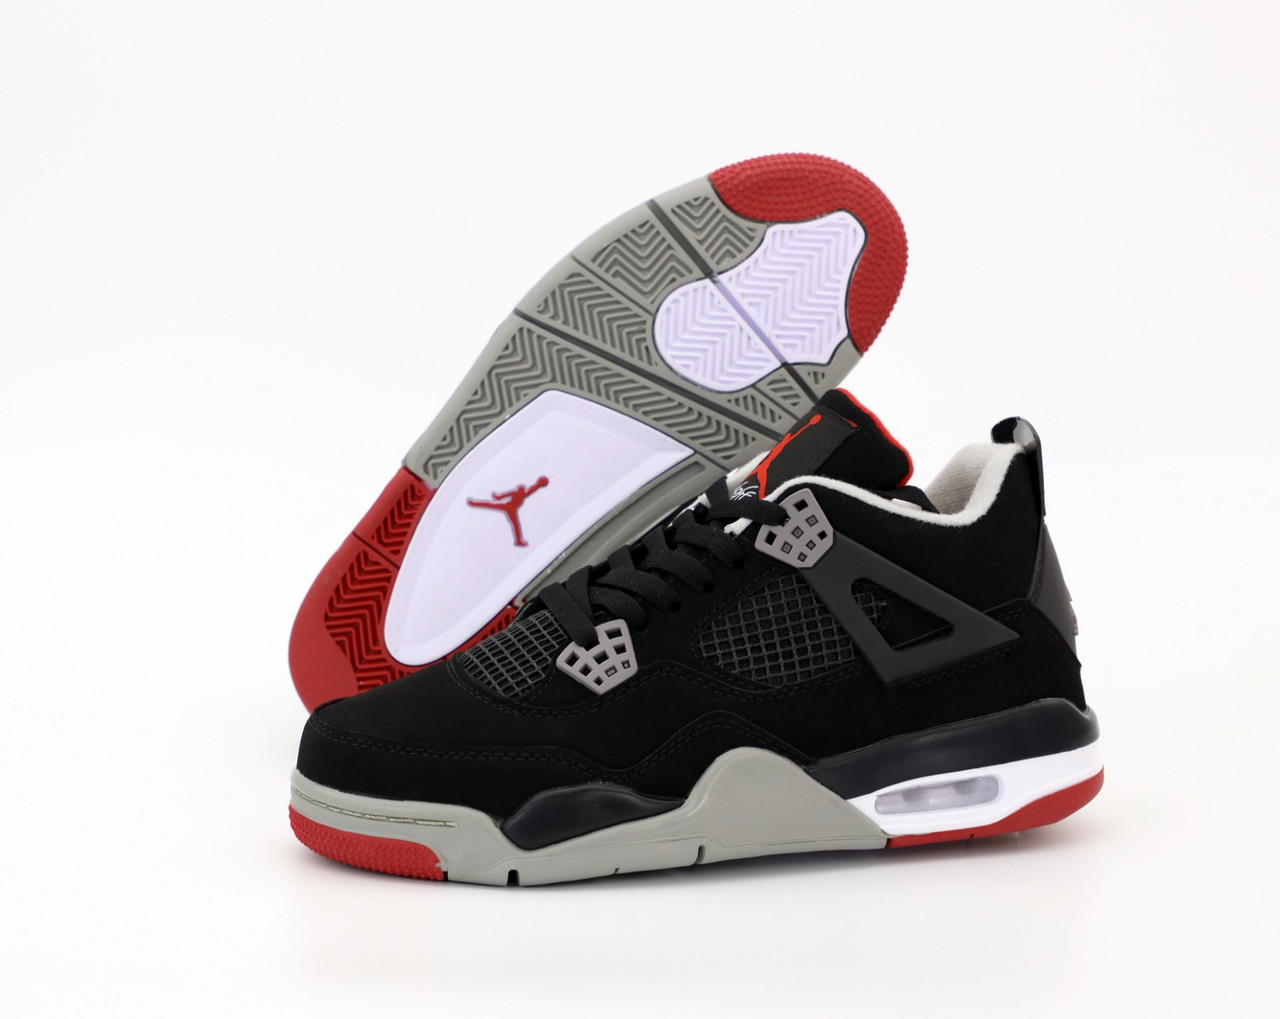 "Мужские кроссовки Off-White x Nike Air Jordan 4 «Sail» коллекции Off-White FW 2020"""